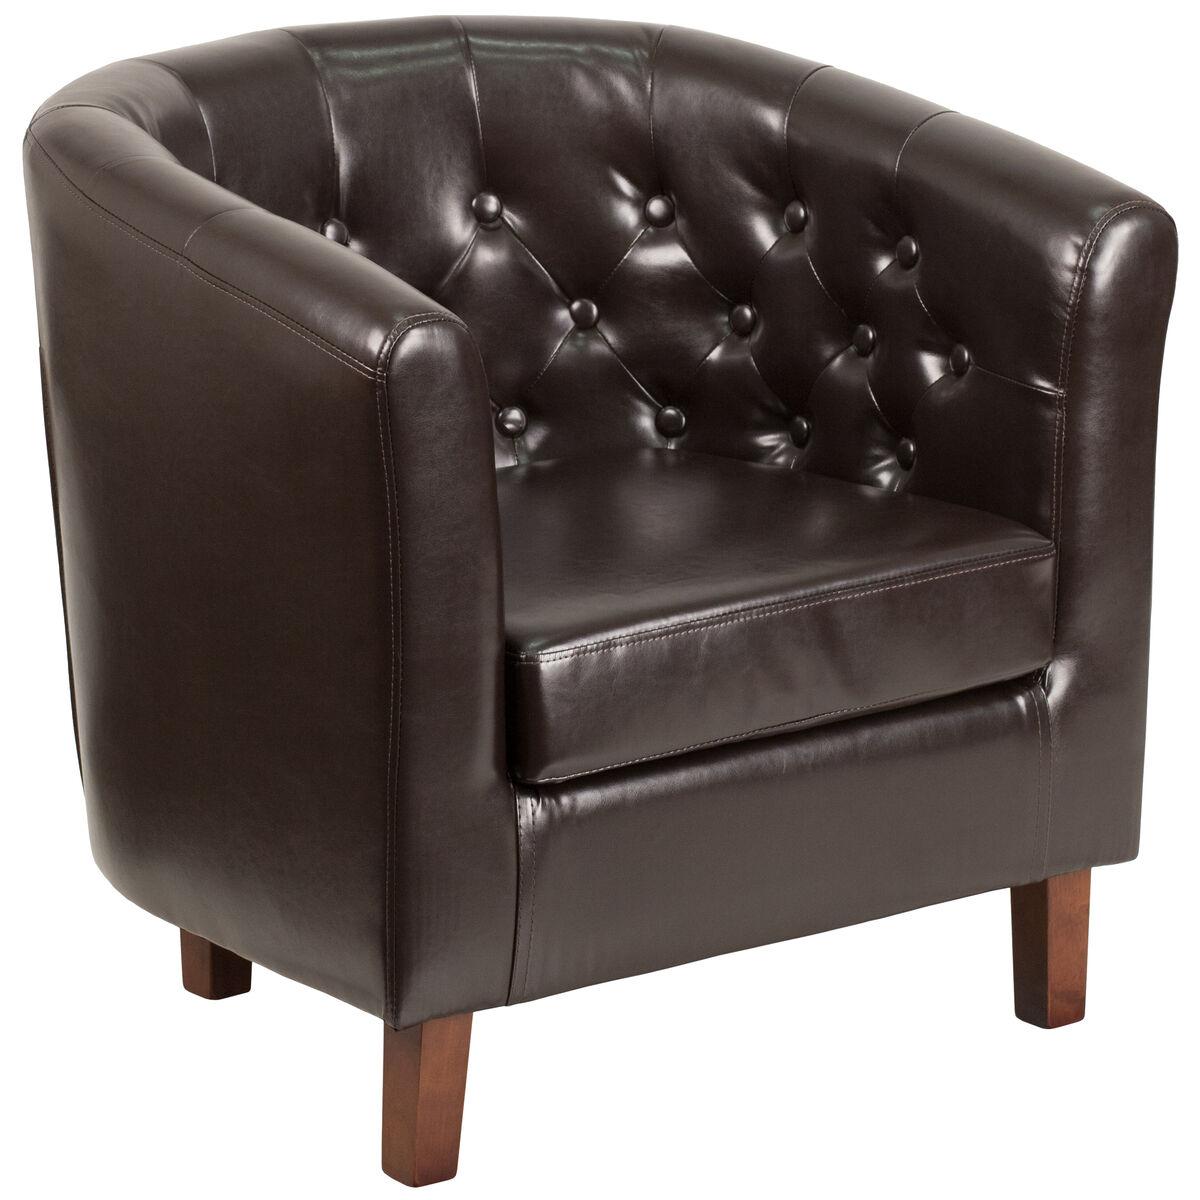 brown leather barrel chair qy b16 hy 9030 4 bn gg bizchair com